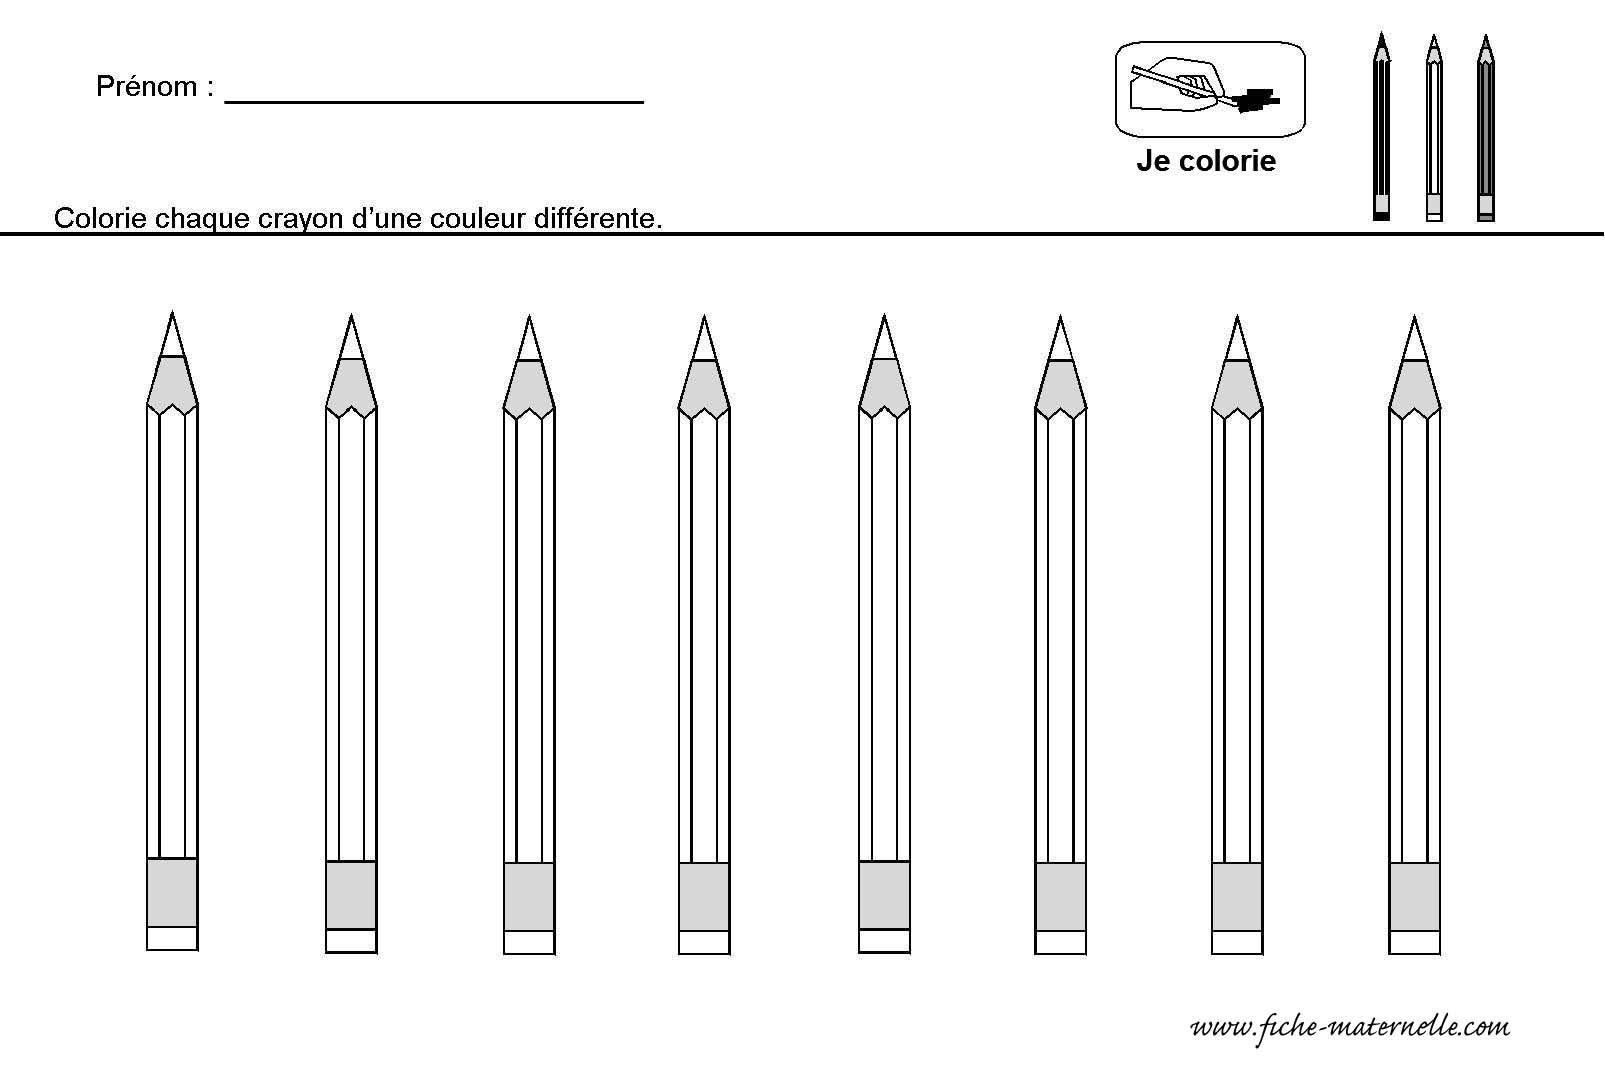 Crayons De Couleur | Kleurplaten, Potlood, Kleuren concernant Crayon Coloriage